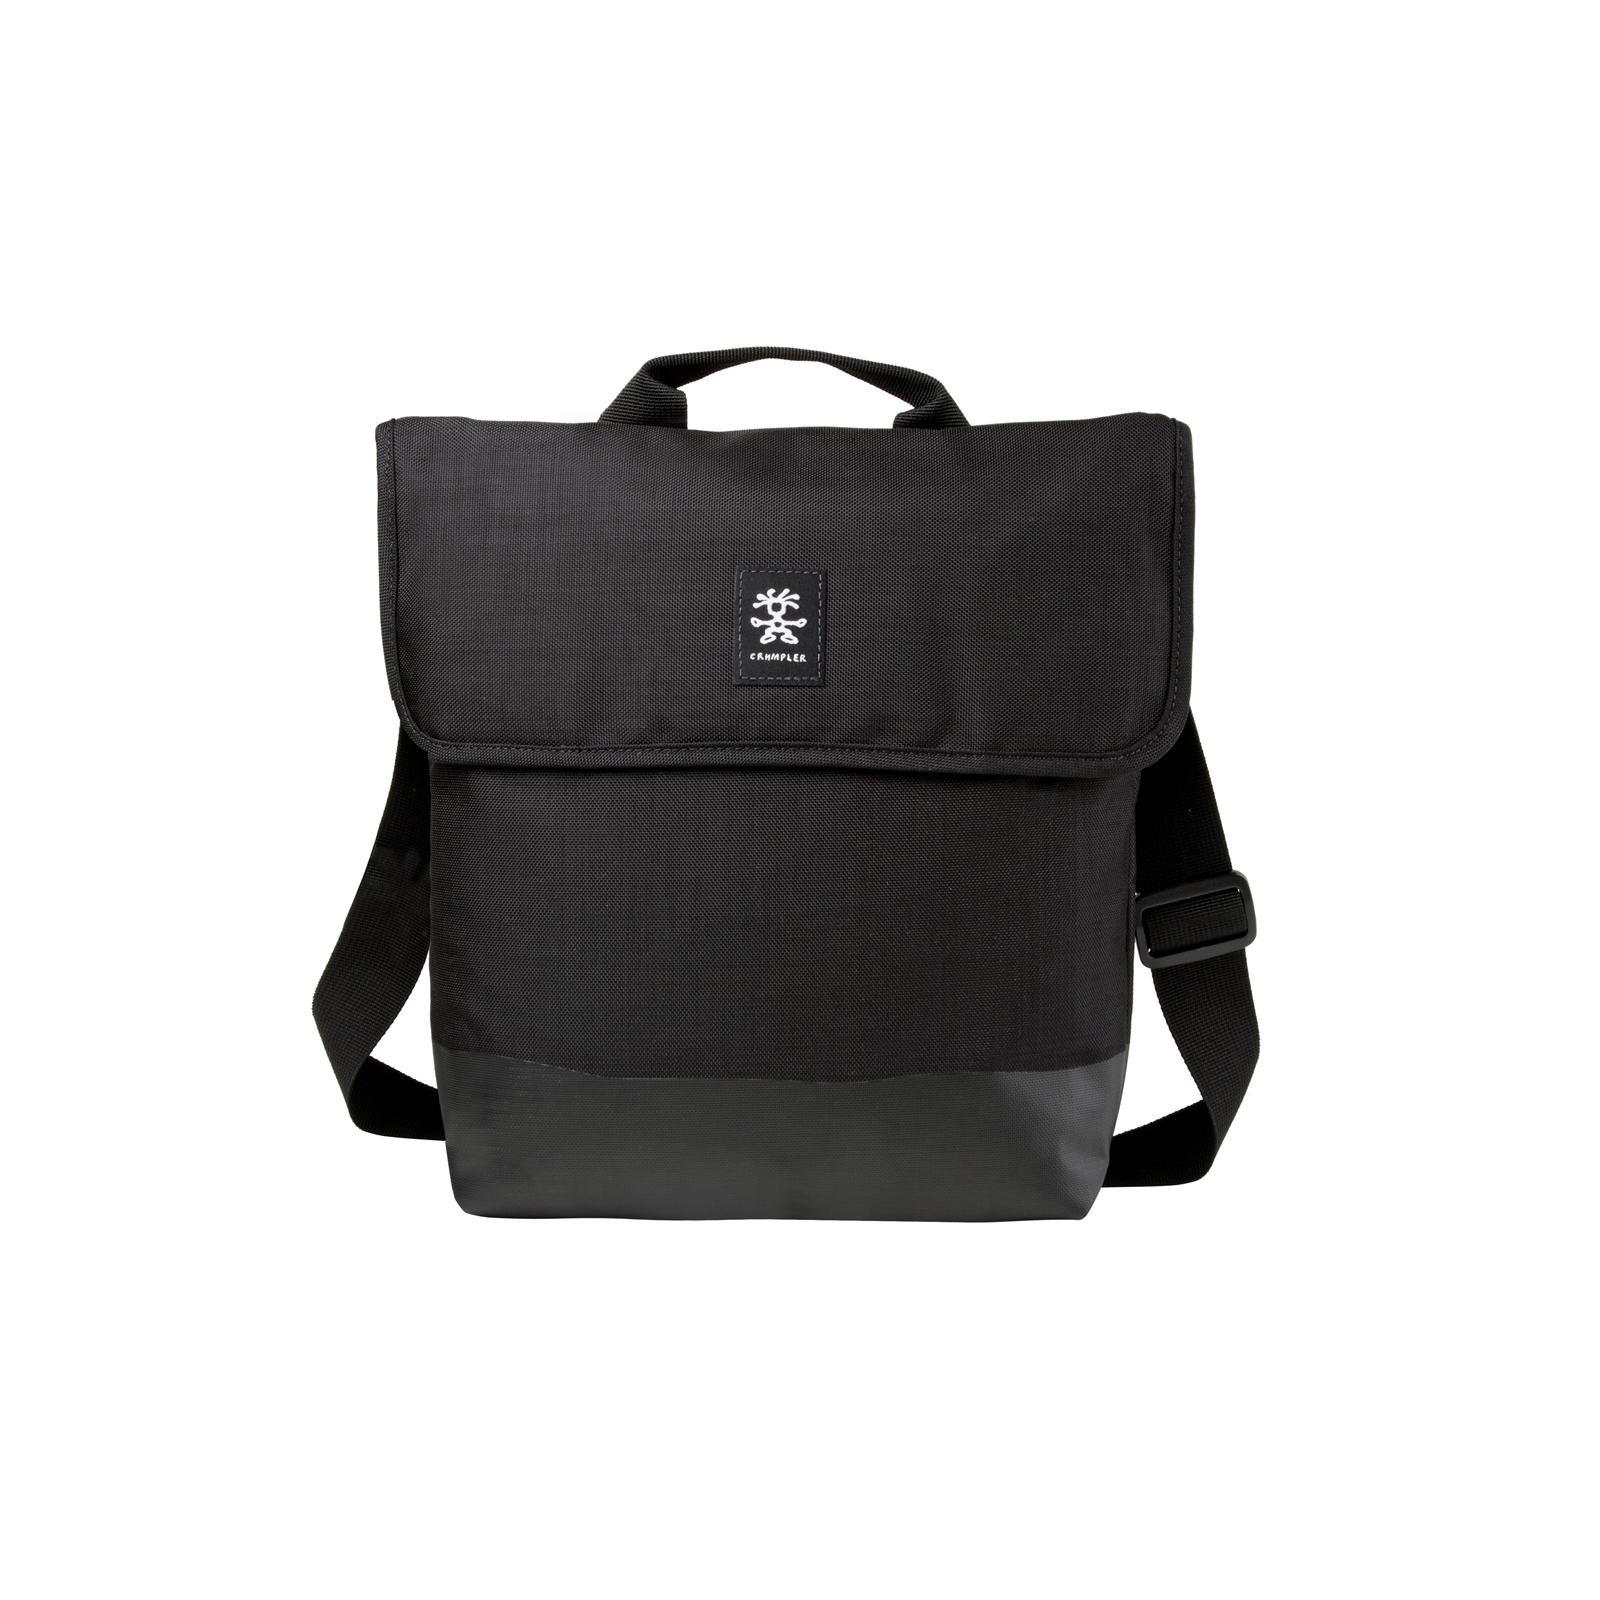 Чехол для планшета Crumpler 9 Private Surprise Sling Tablet/black-black (PSST-001)